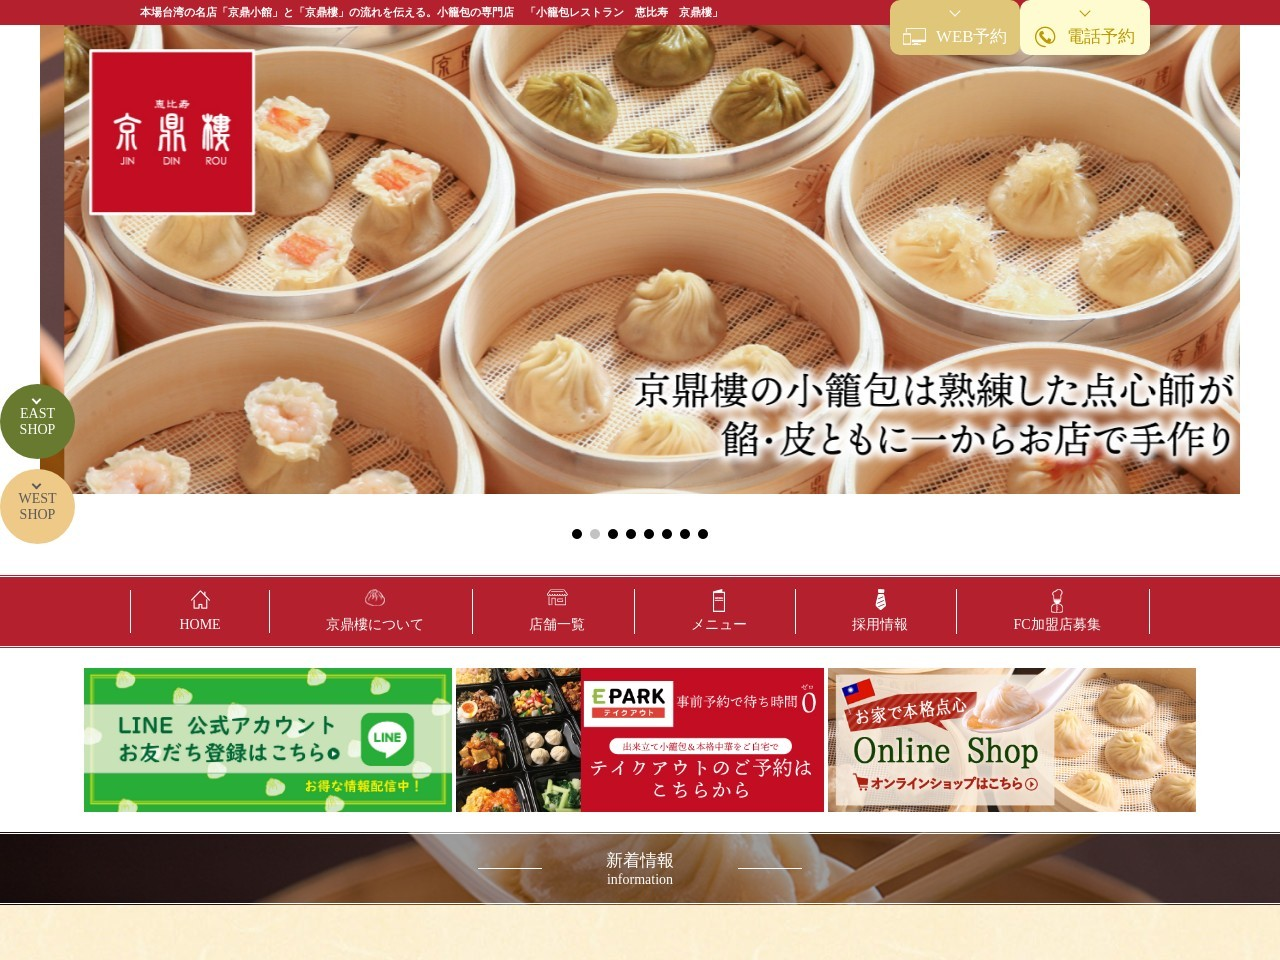 http://jin-din-rou.net/index.html